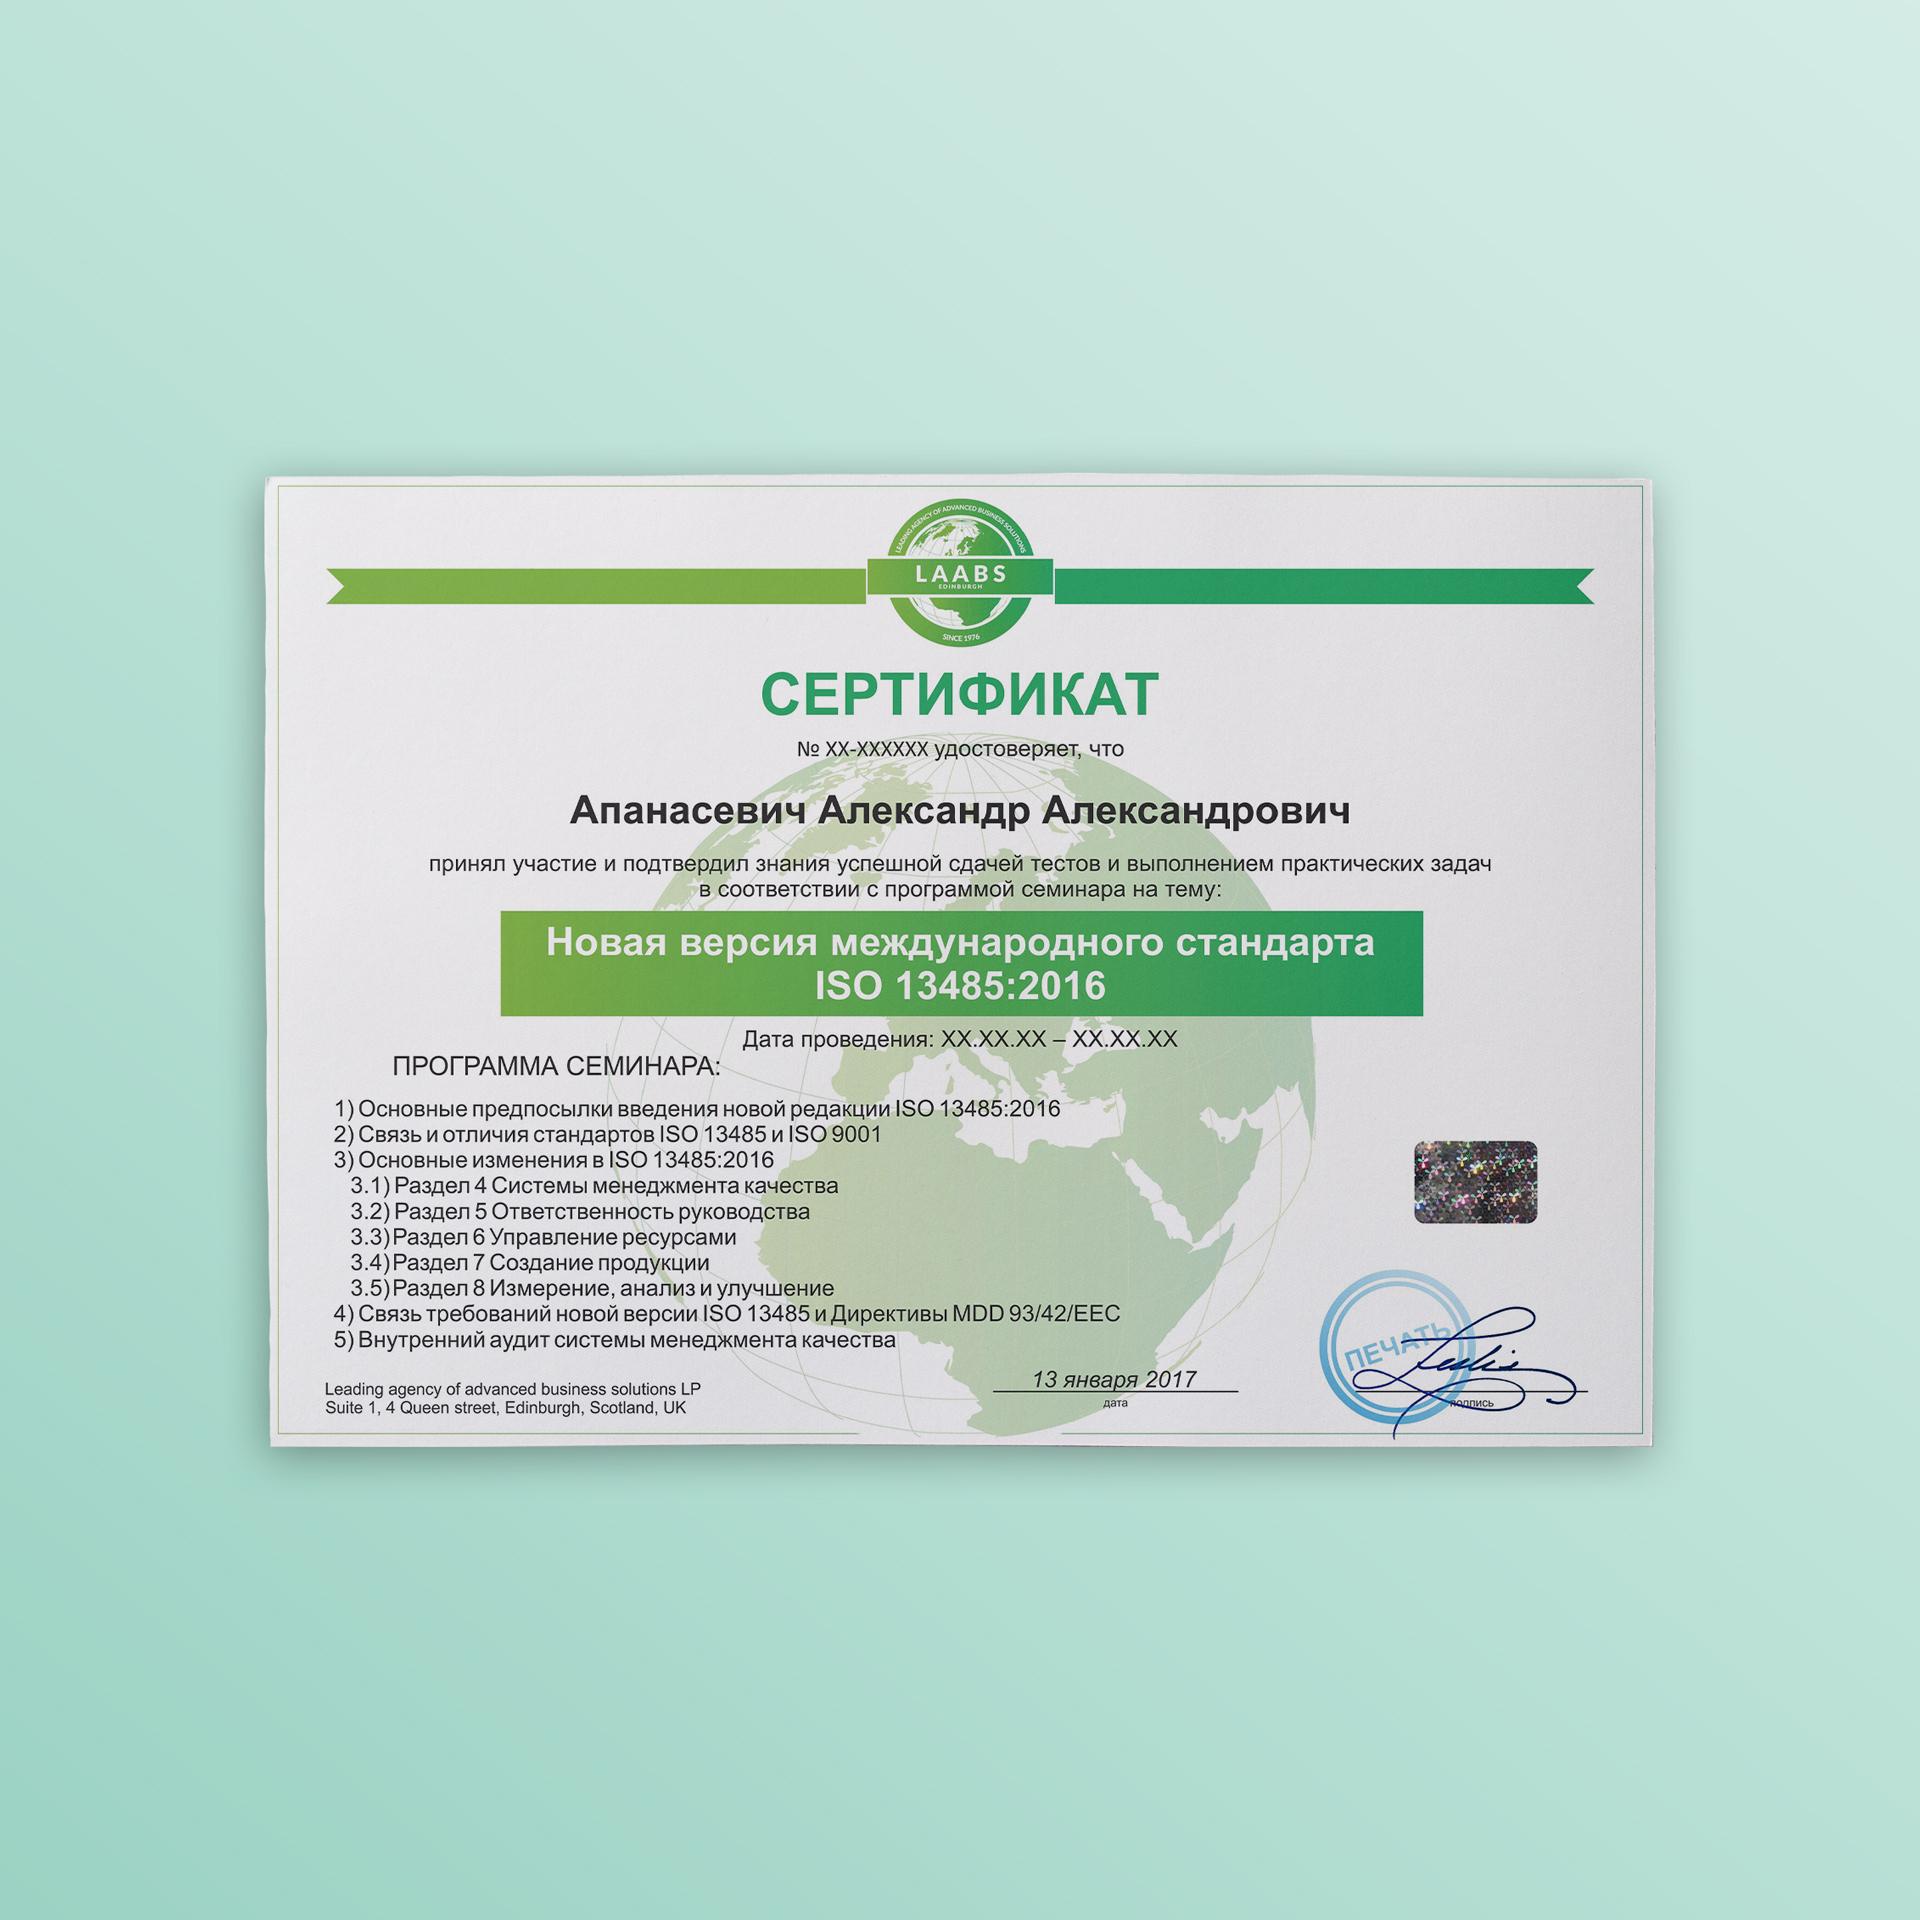 Необходимо разработать дизайн 3 сертификатов фото f_045587cb2e8f3941.jpg